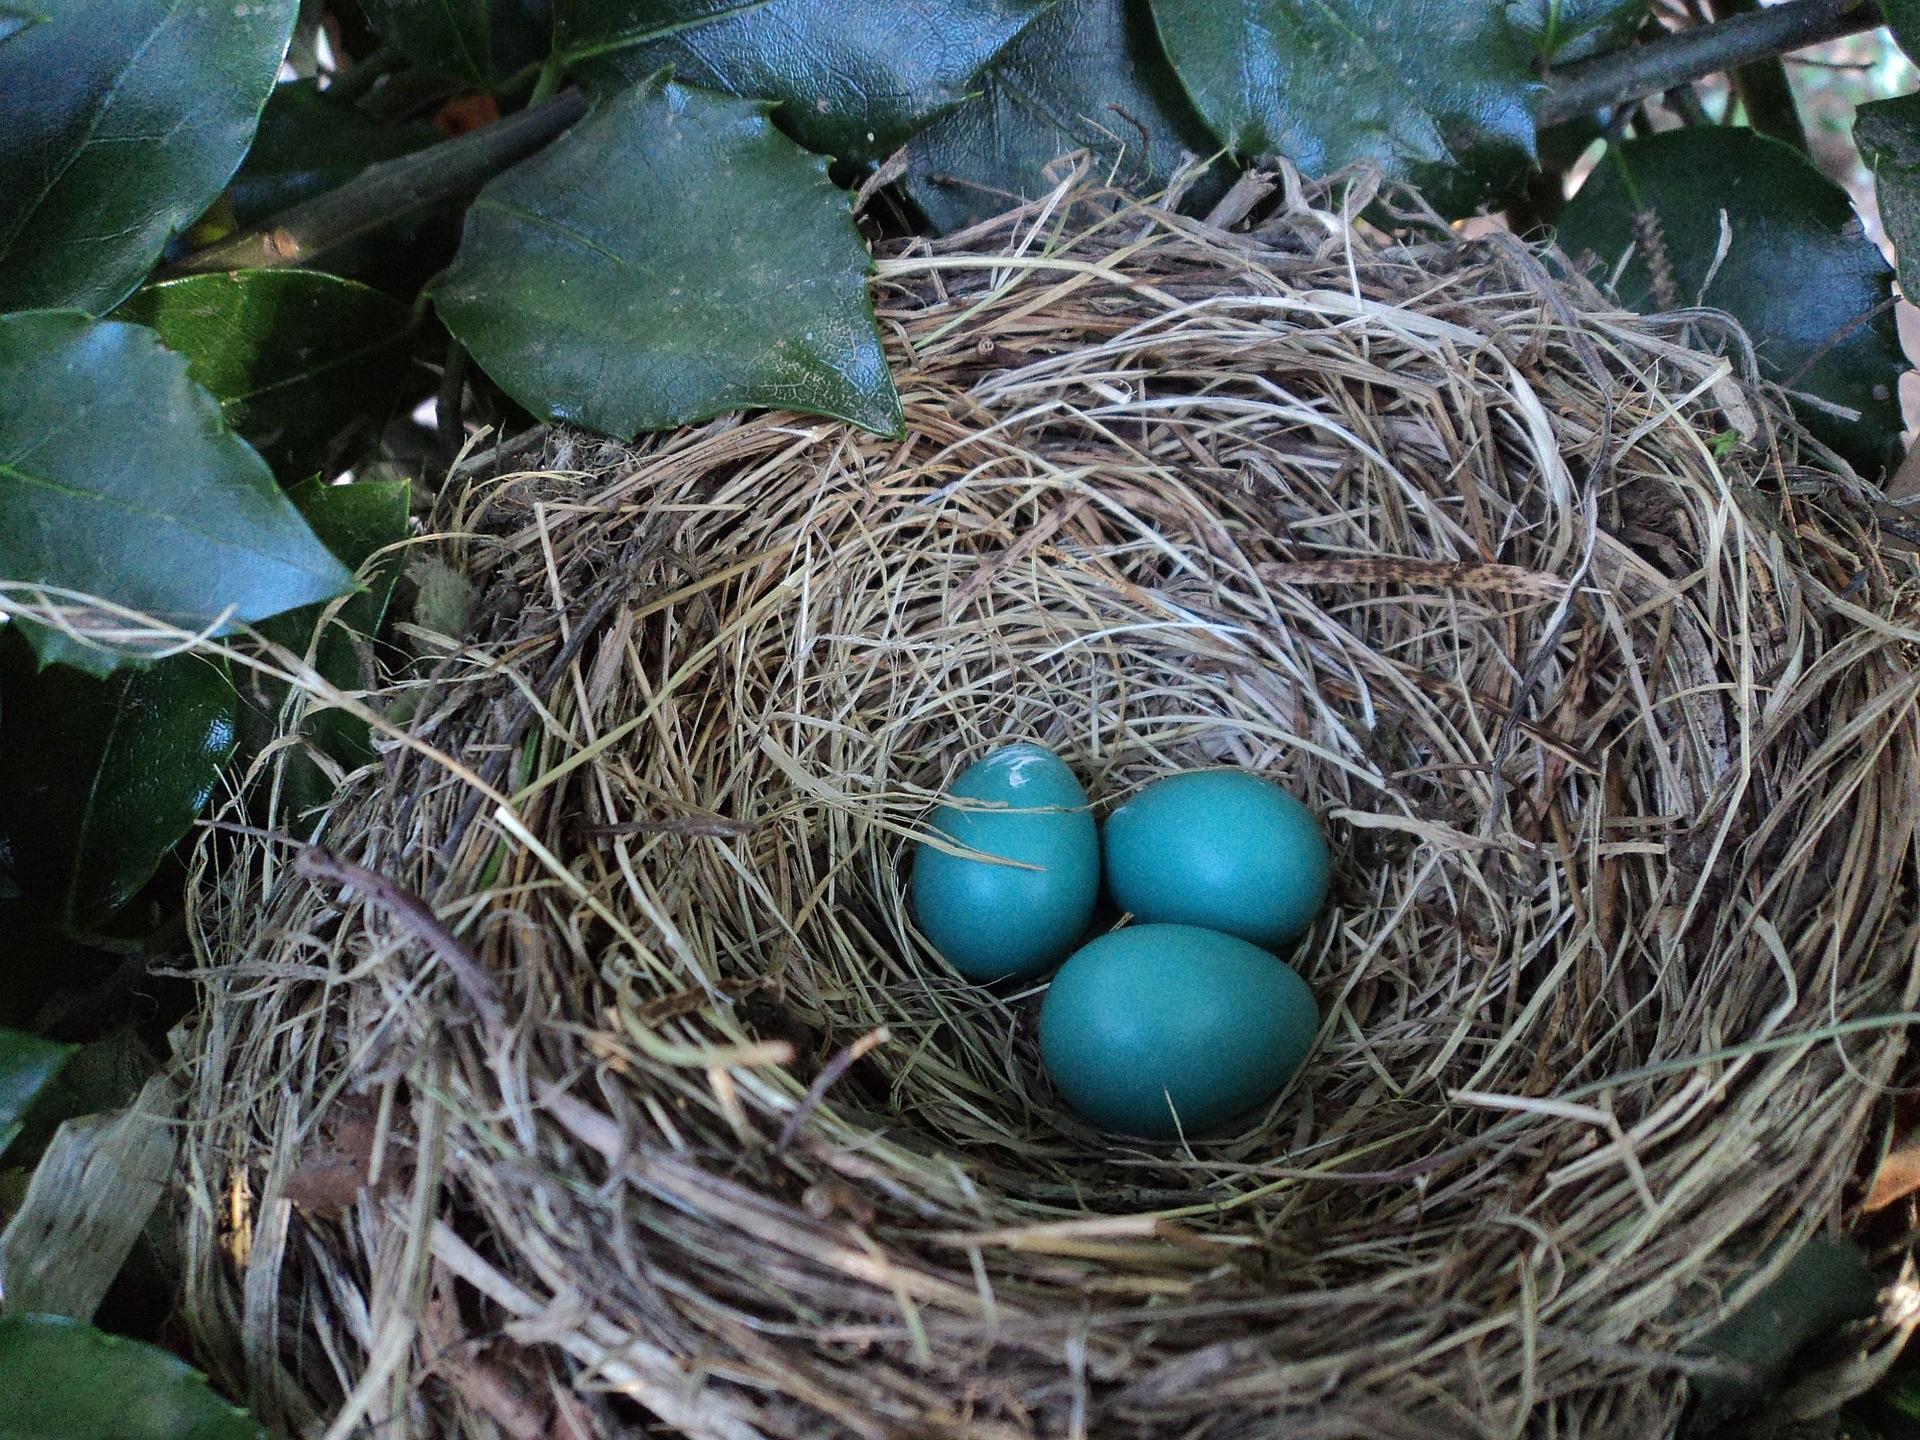 Bird's nest with three blue eggs